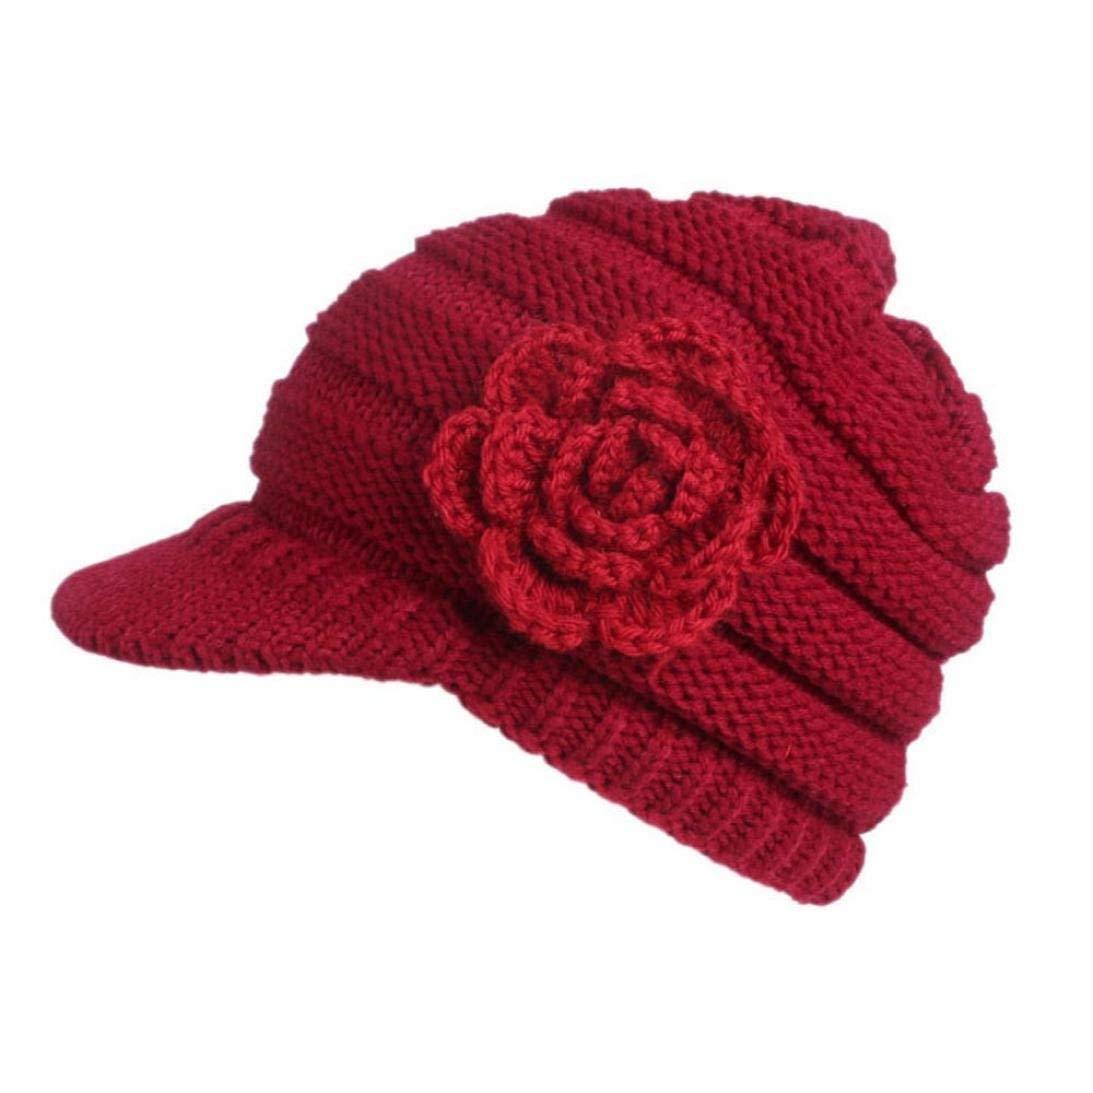 HENGSONG Womens Warm Wool Berets Beanies Tam Baggy Hats Ski Caps White